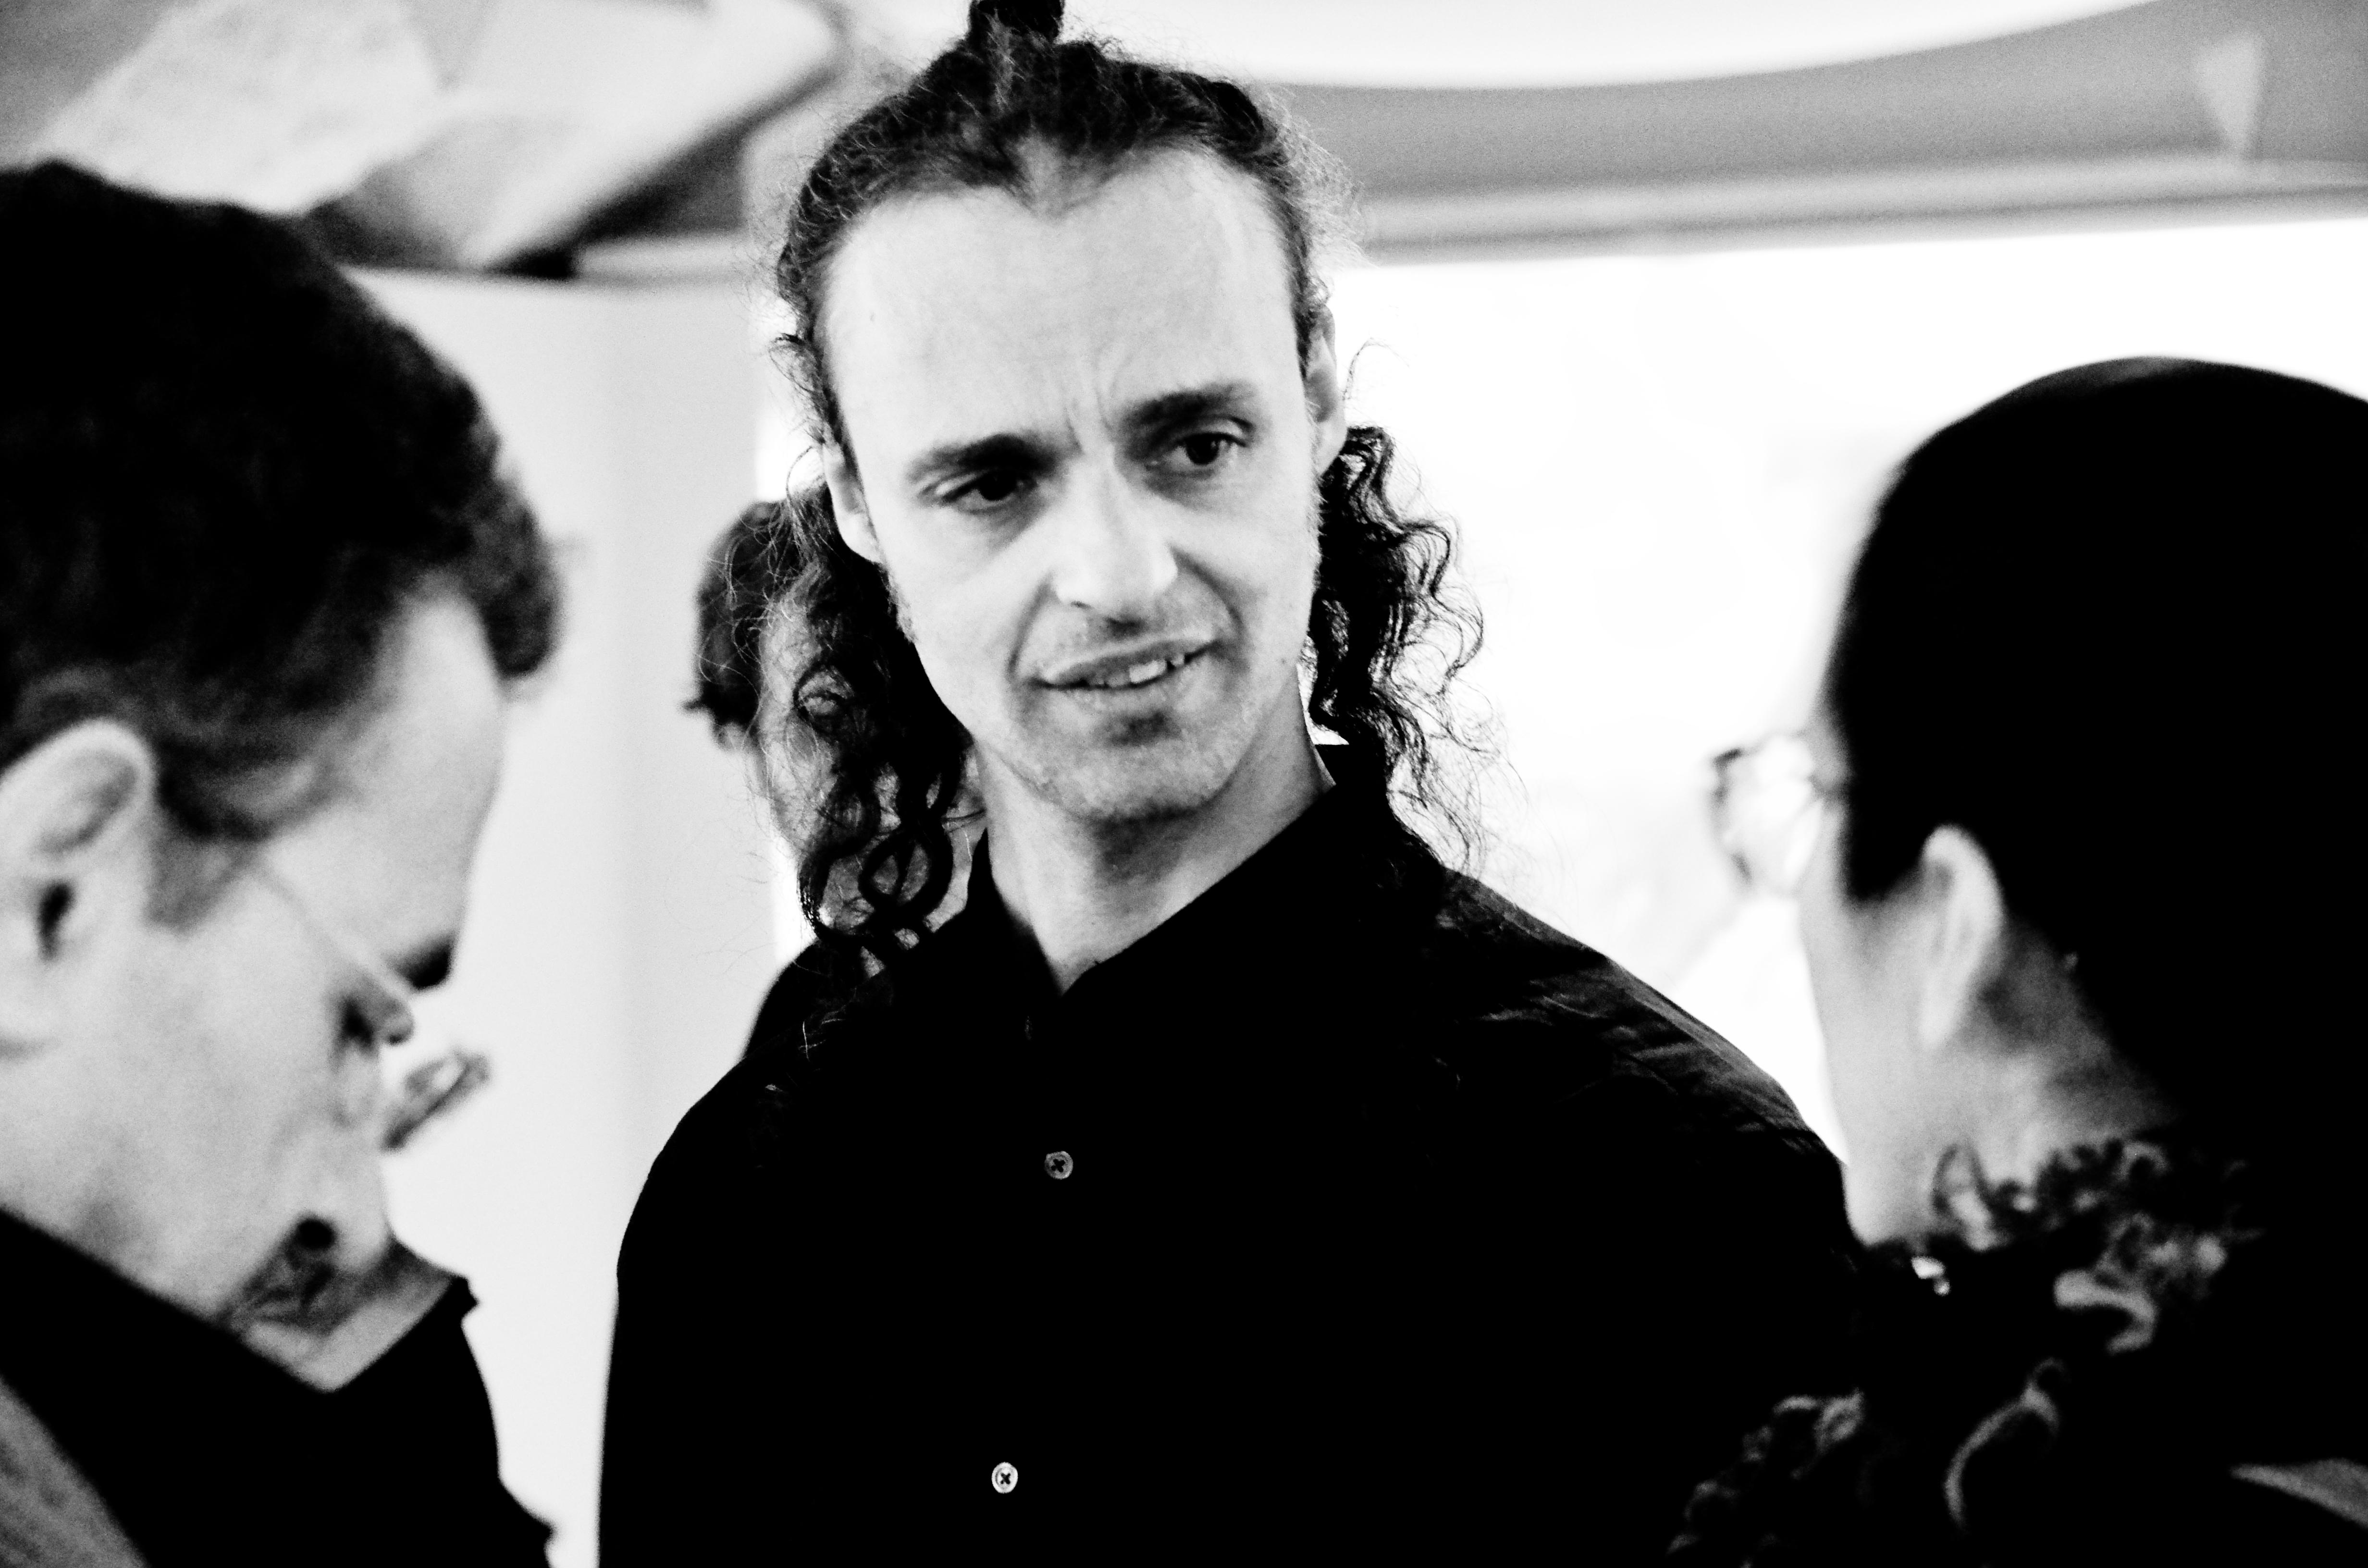 Antonio Mezcua acting